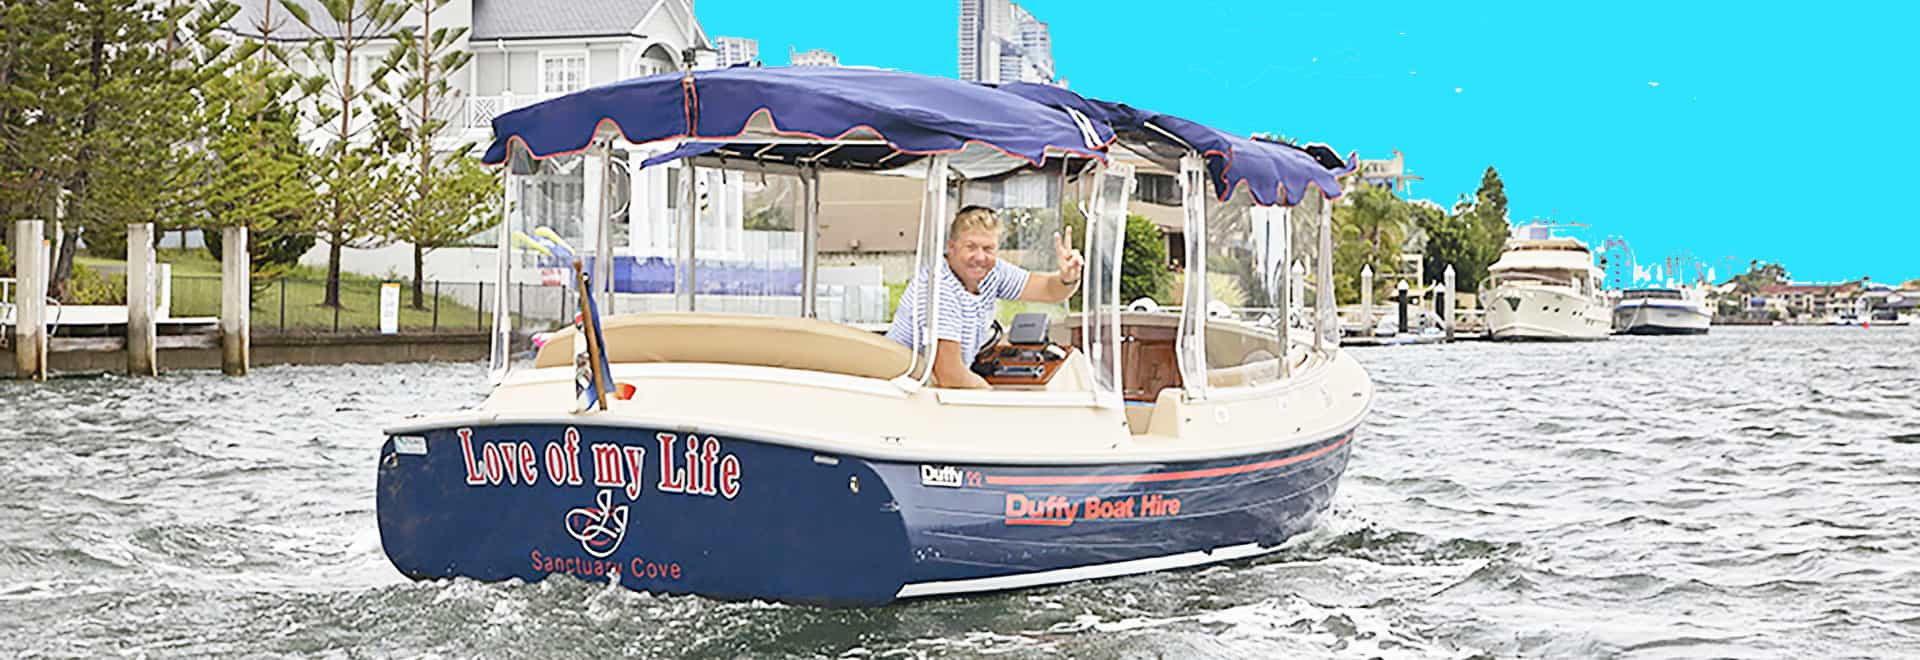 duffy-boat-hire-gold-coast